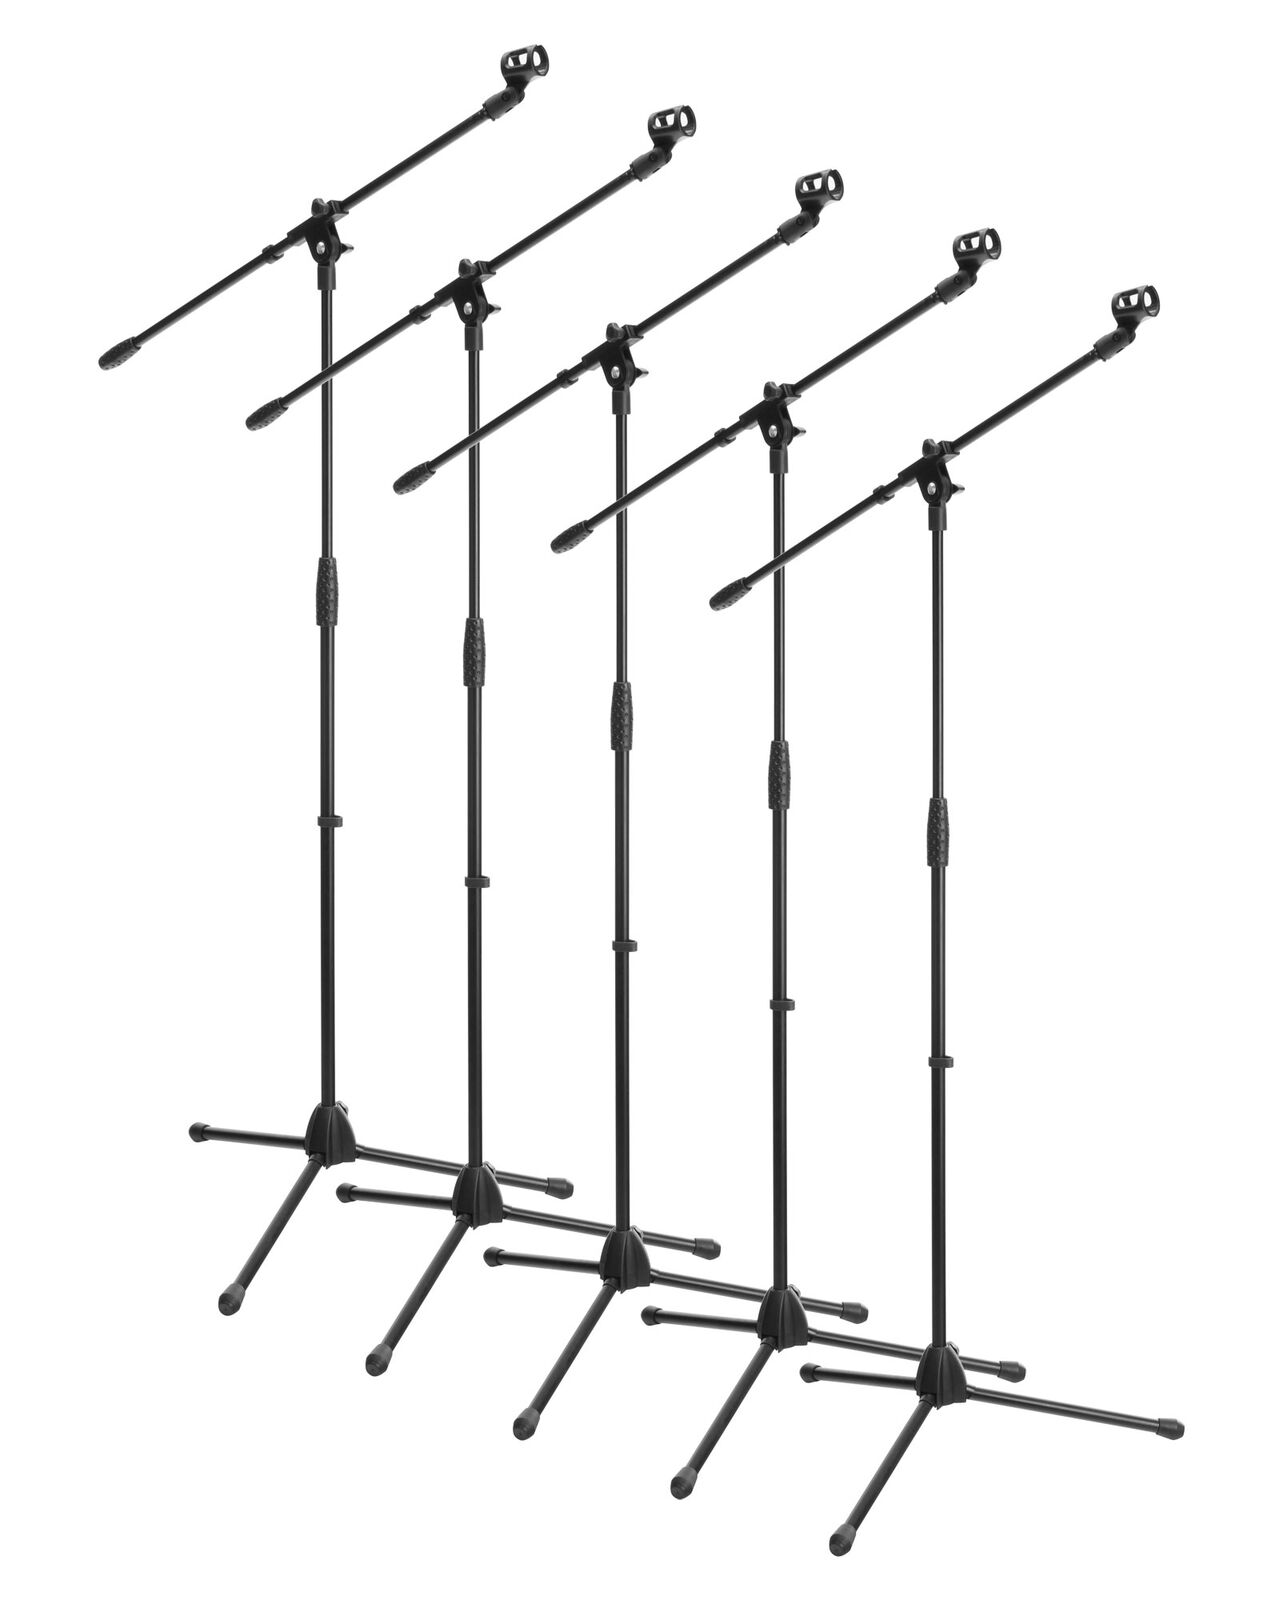 5x Support Trepied Monture Potence a Microphone Studio Scene Hauteur Ajustable